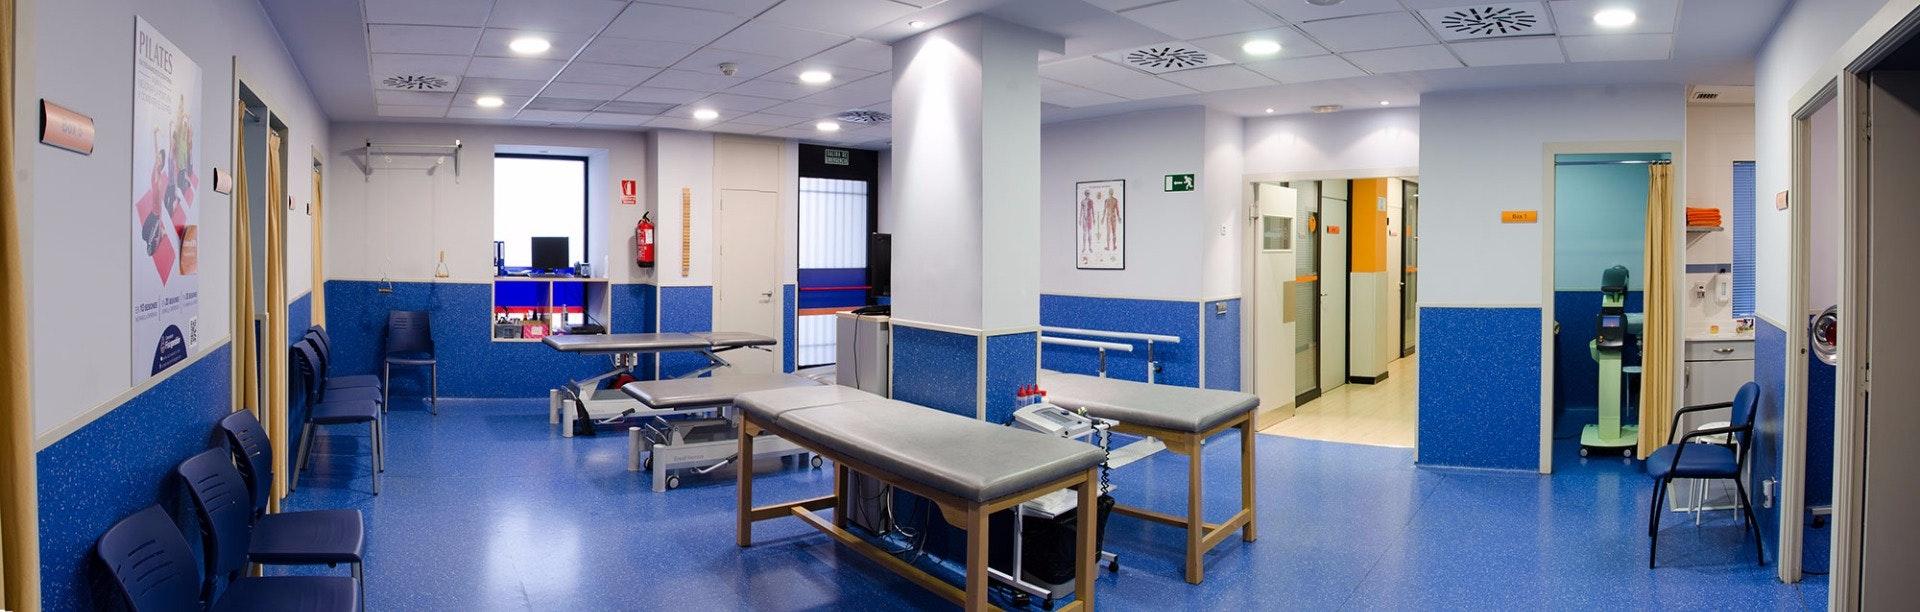 Foto 1 Oferta Fisiogestión Plaza España Masaje Madrid {2} - GymForLess